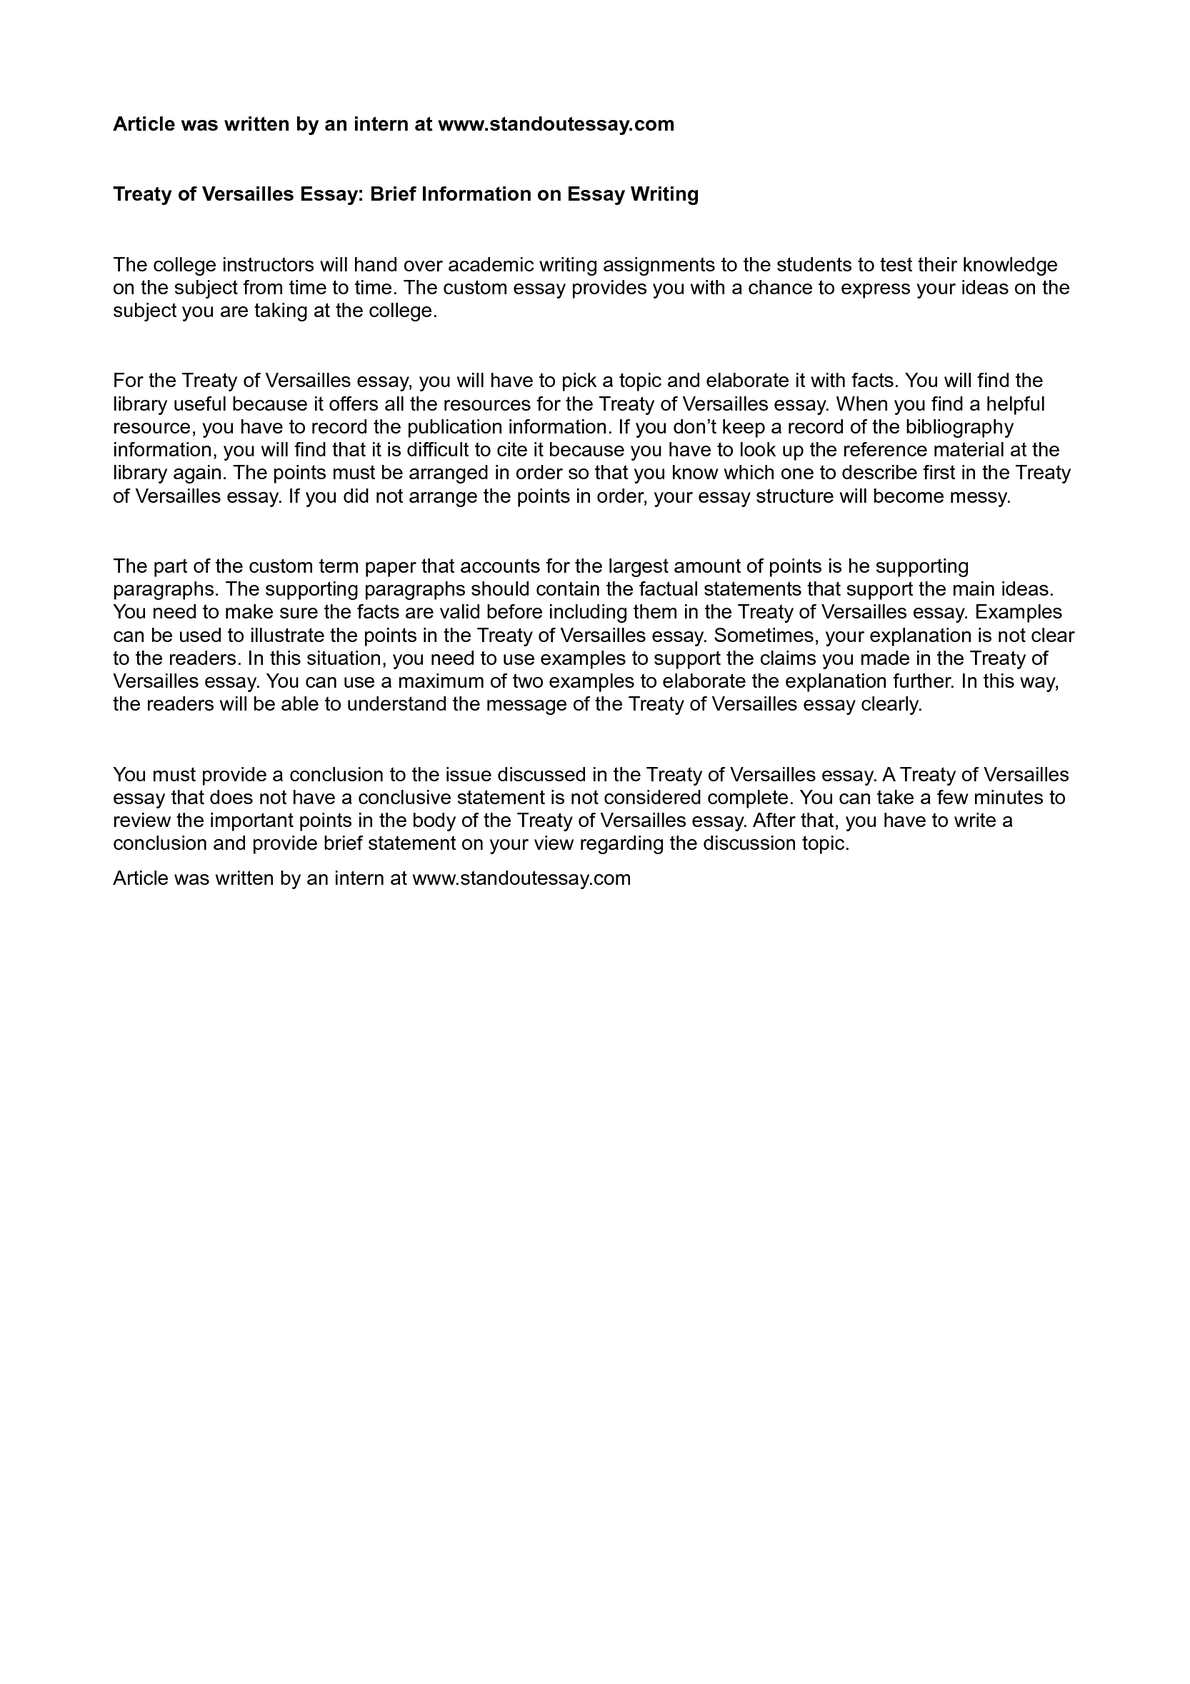 Calamo  Treaty Of Versailles Essay Brief Information On Essay Writing